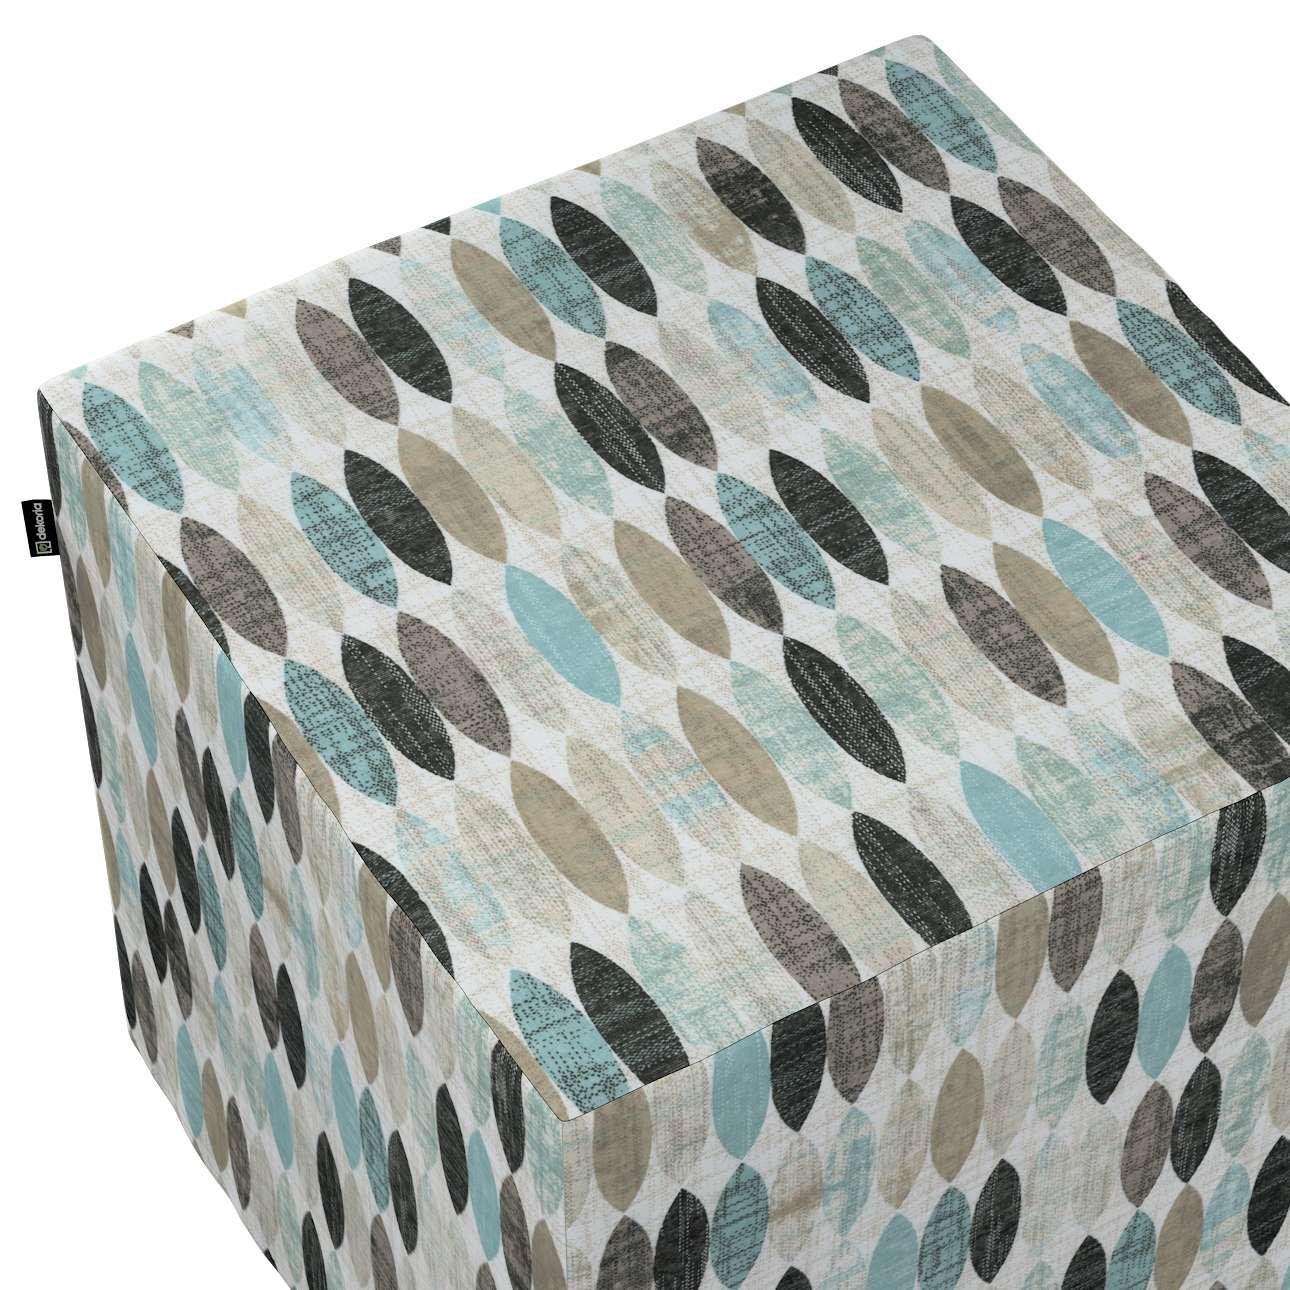 Pufa kostka w kolekcji Modern, tkanina: 141-91